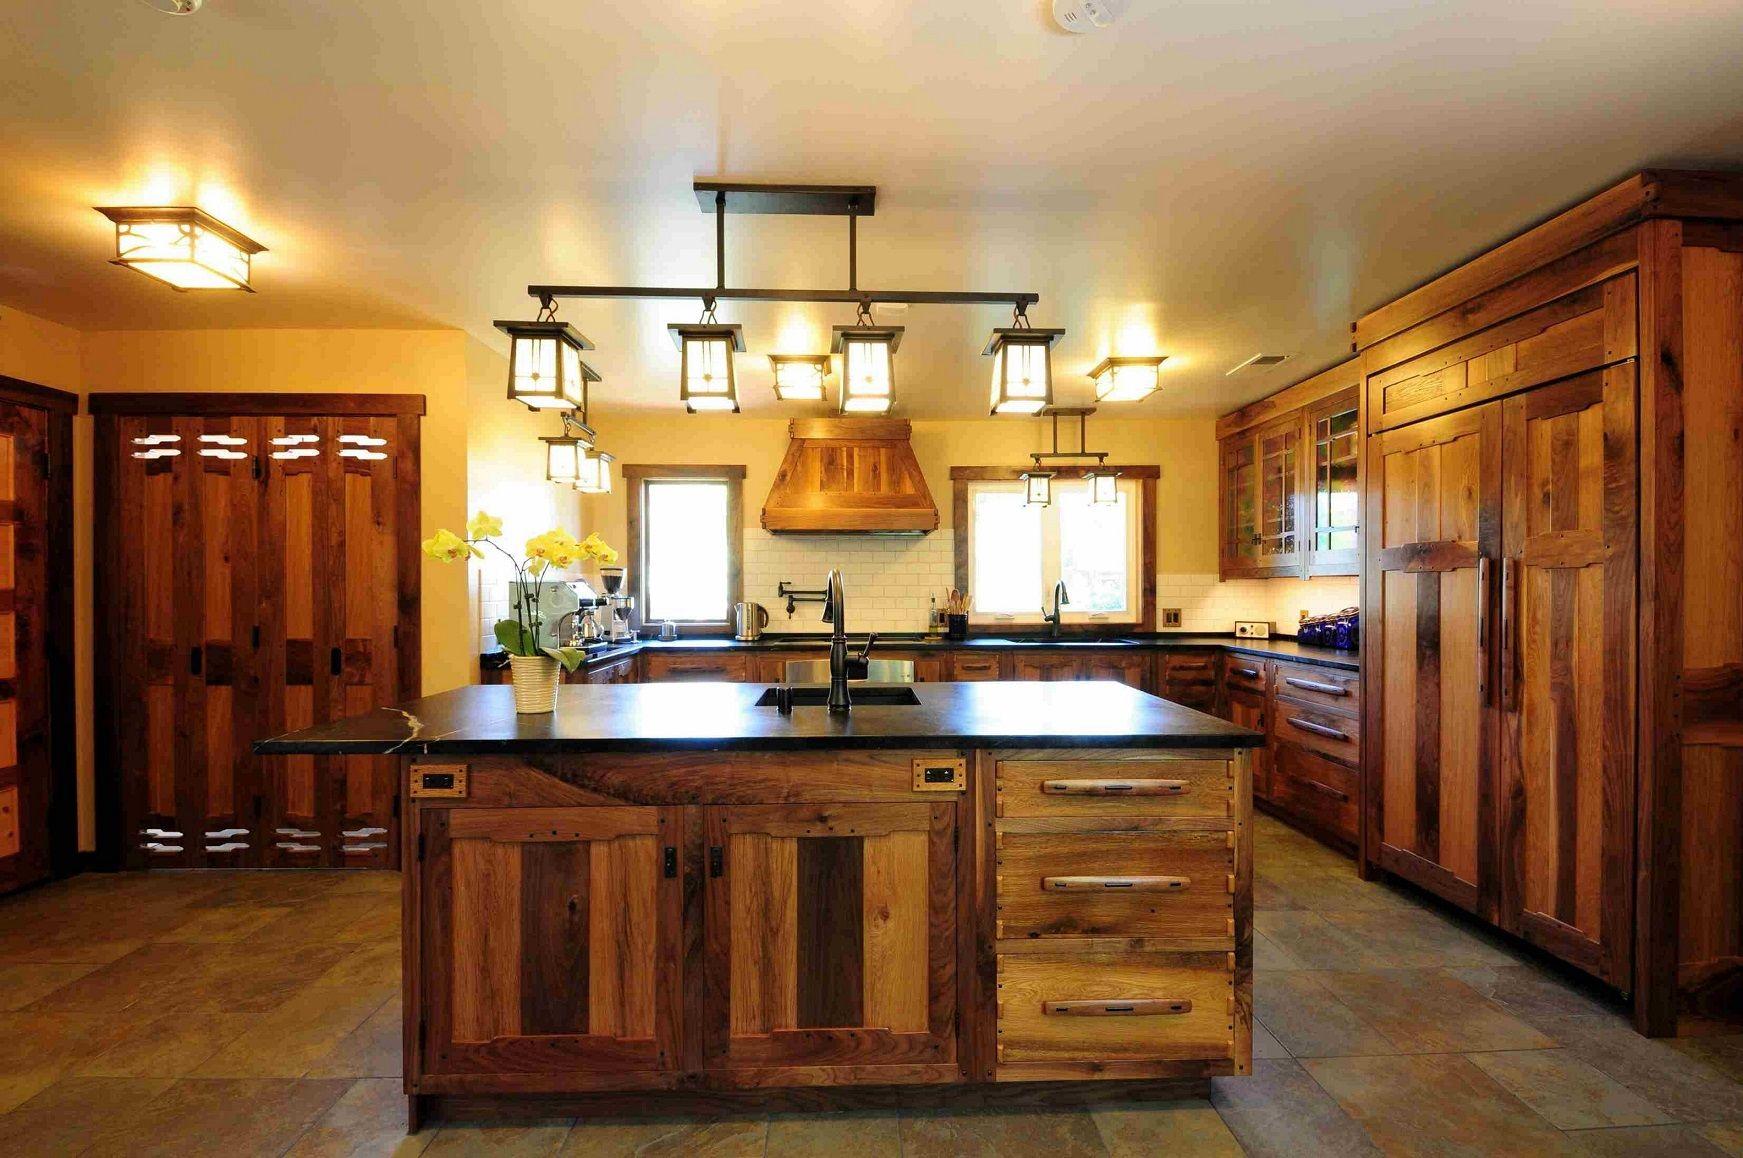 Drum Shade Pendant Light Rustic Kitchen Design Kitchen Lighting